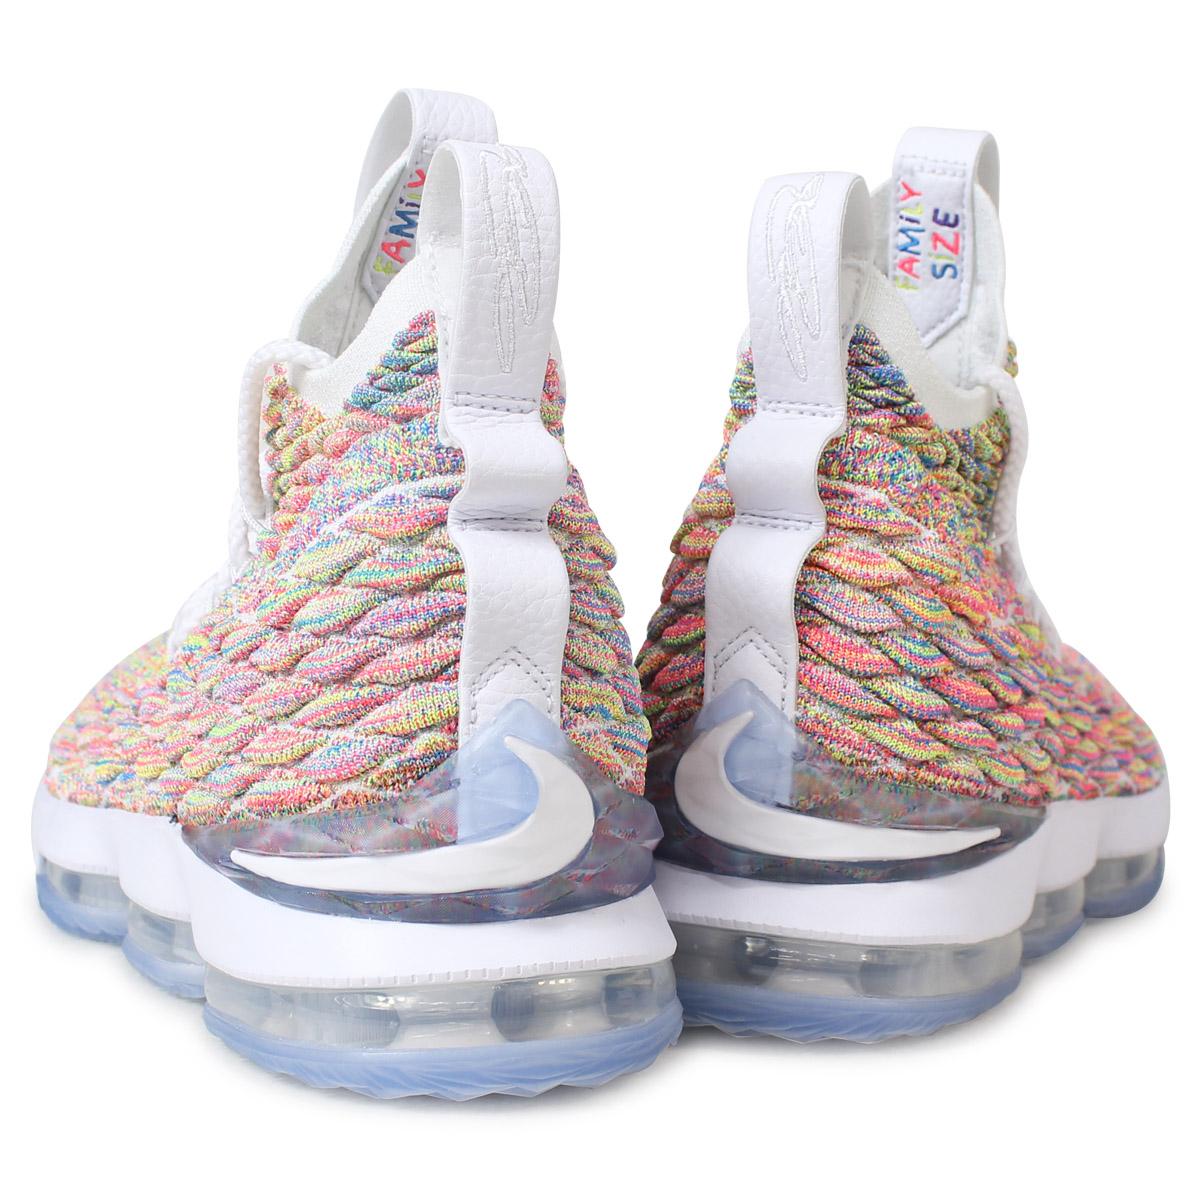 f3e92e54fa98 NIKE LEBRON 15 EP CEREAL Nike Revlon 15 sneakers men AO1754-900 white  185